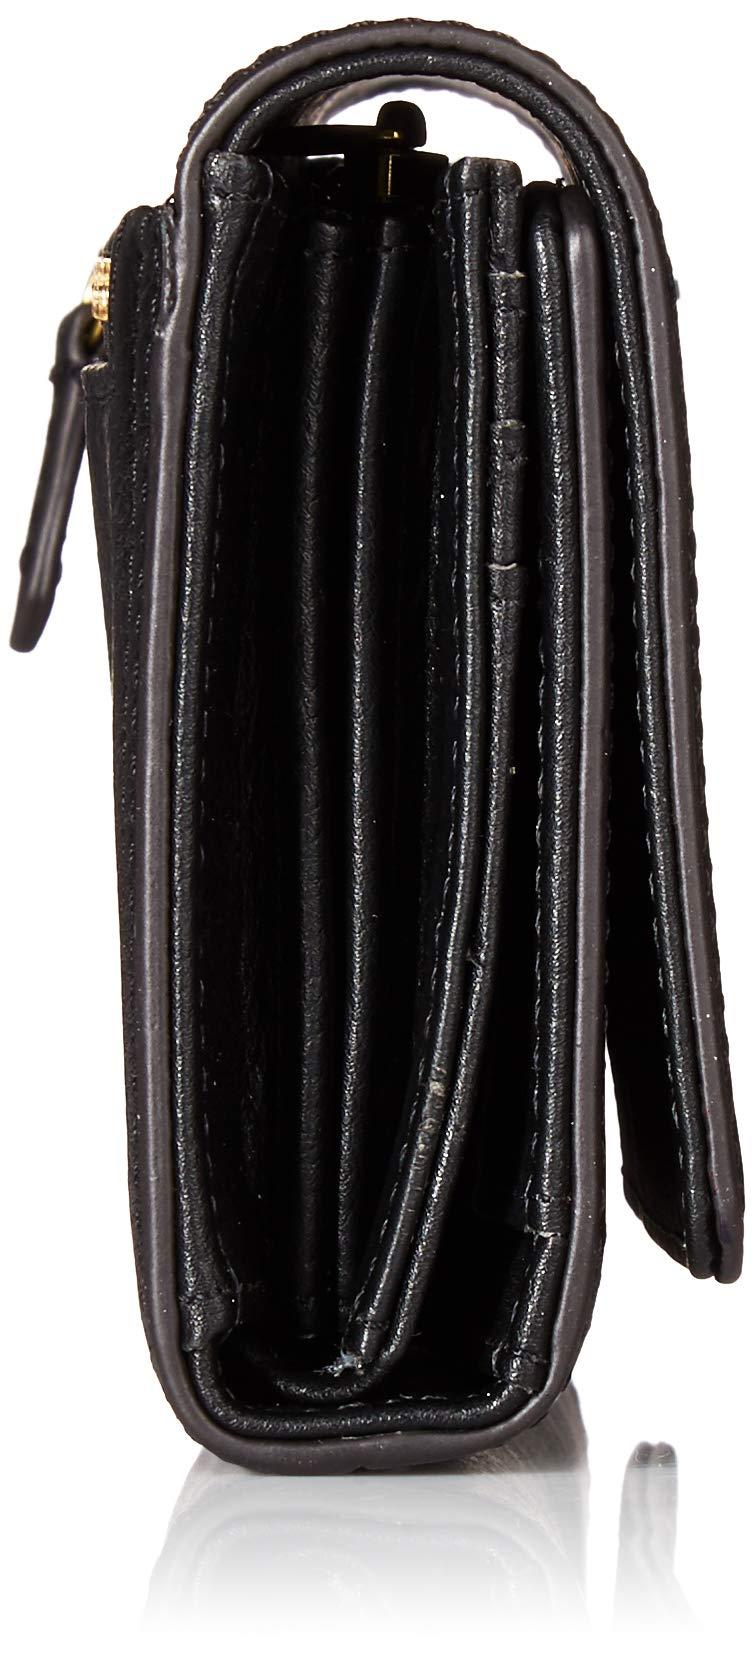 Fossil Logan RFID Flap Clutch Black by Fossil (Image #3)